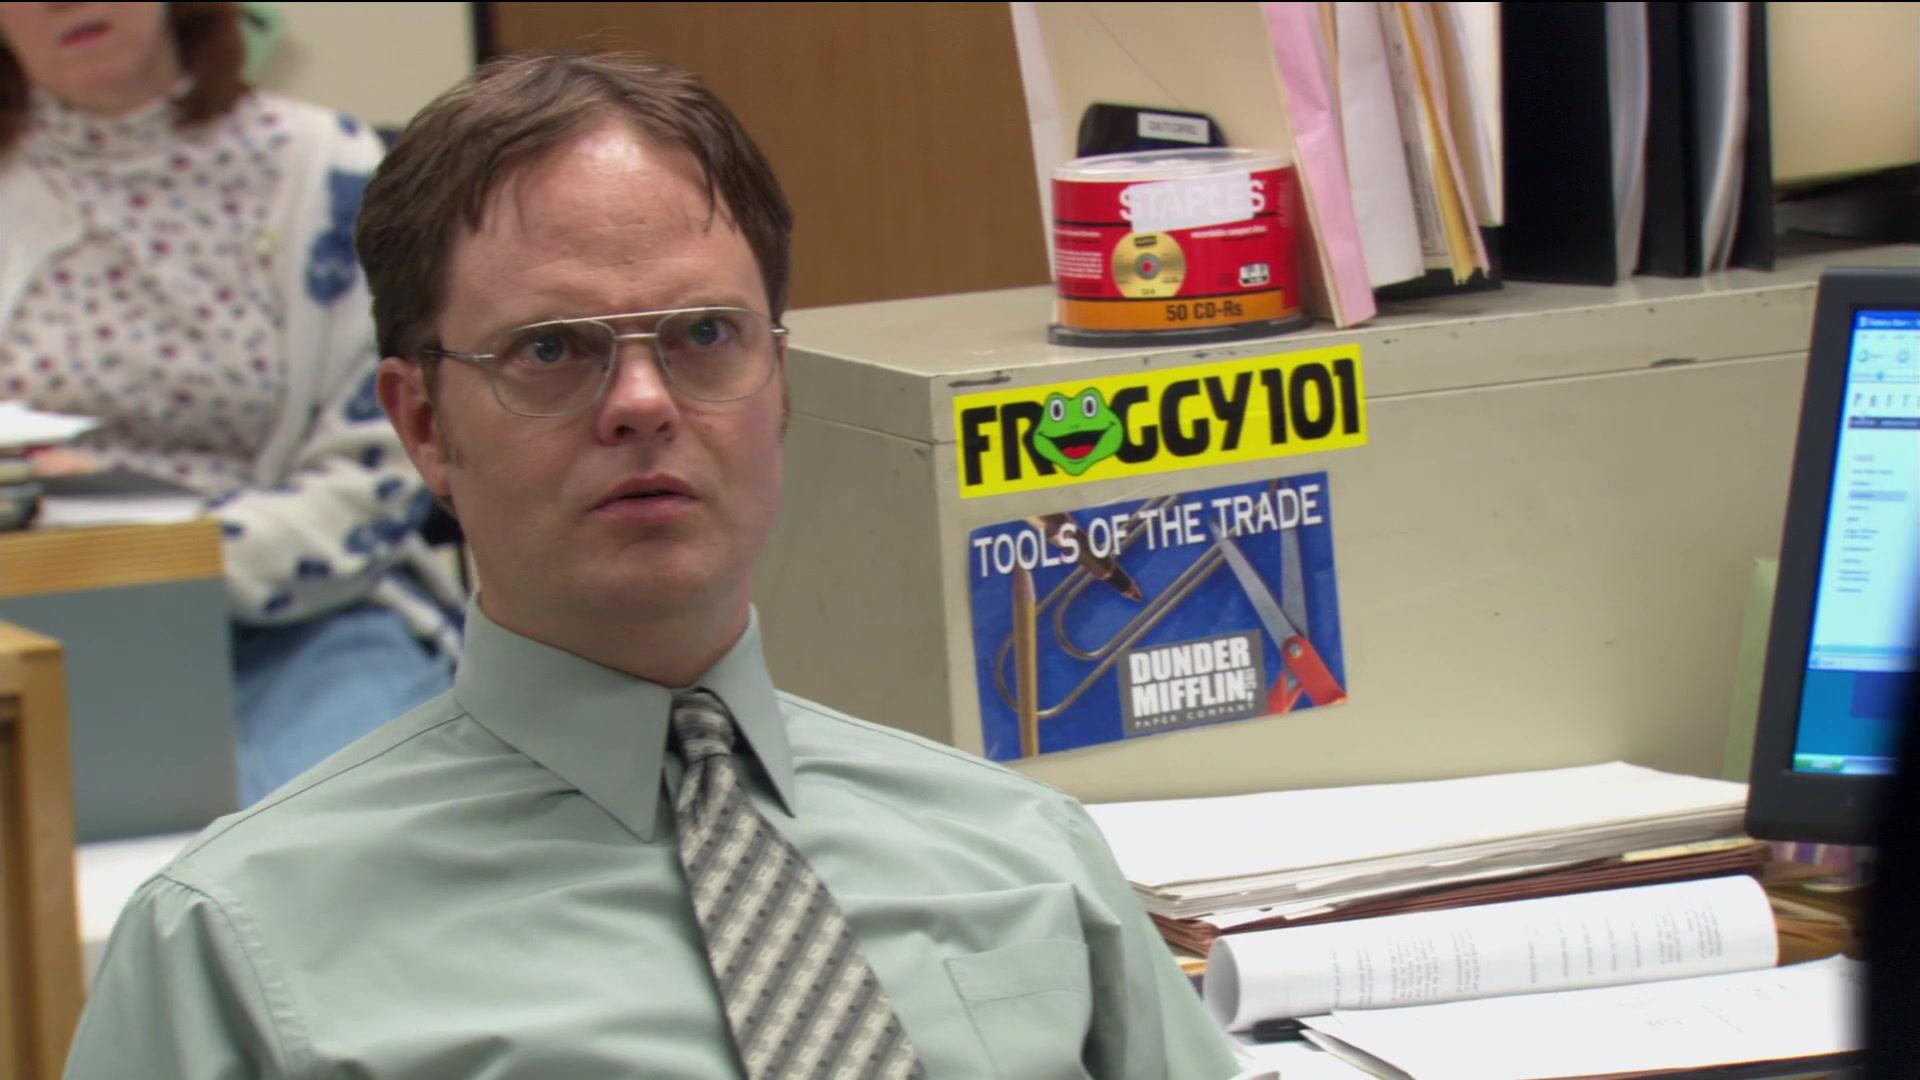 Froggy 101 fm scranton radio station sticker in the office season 2 episode 9